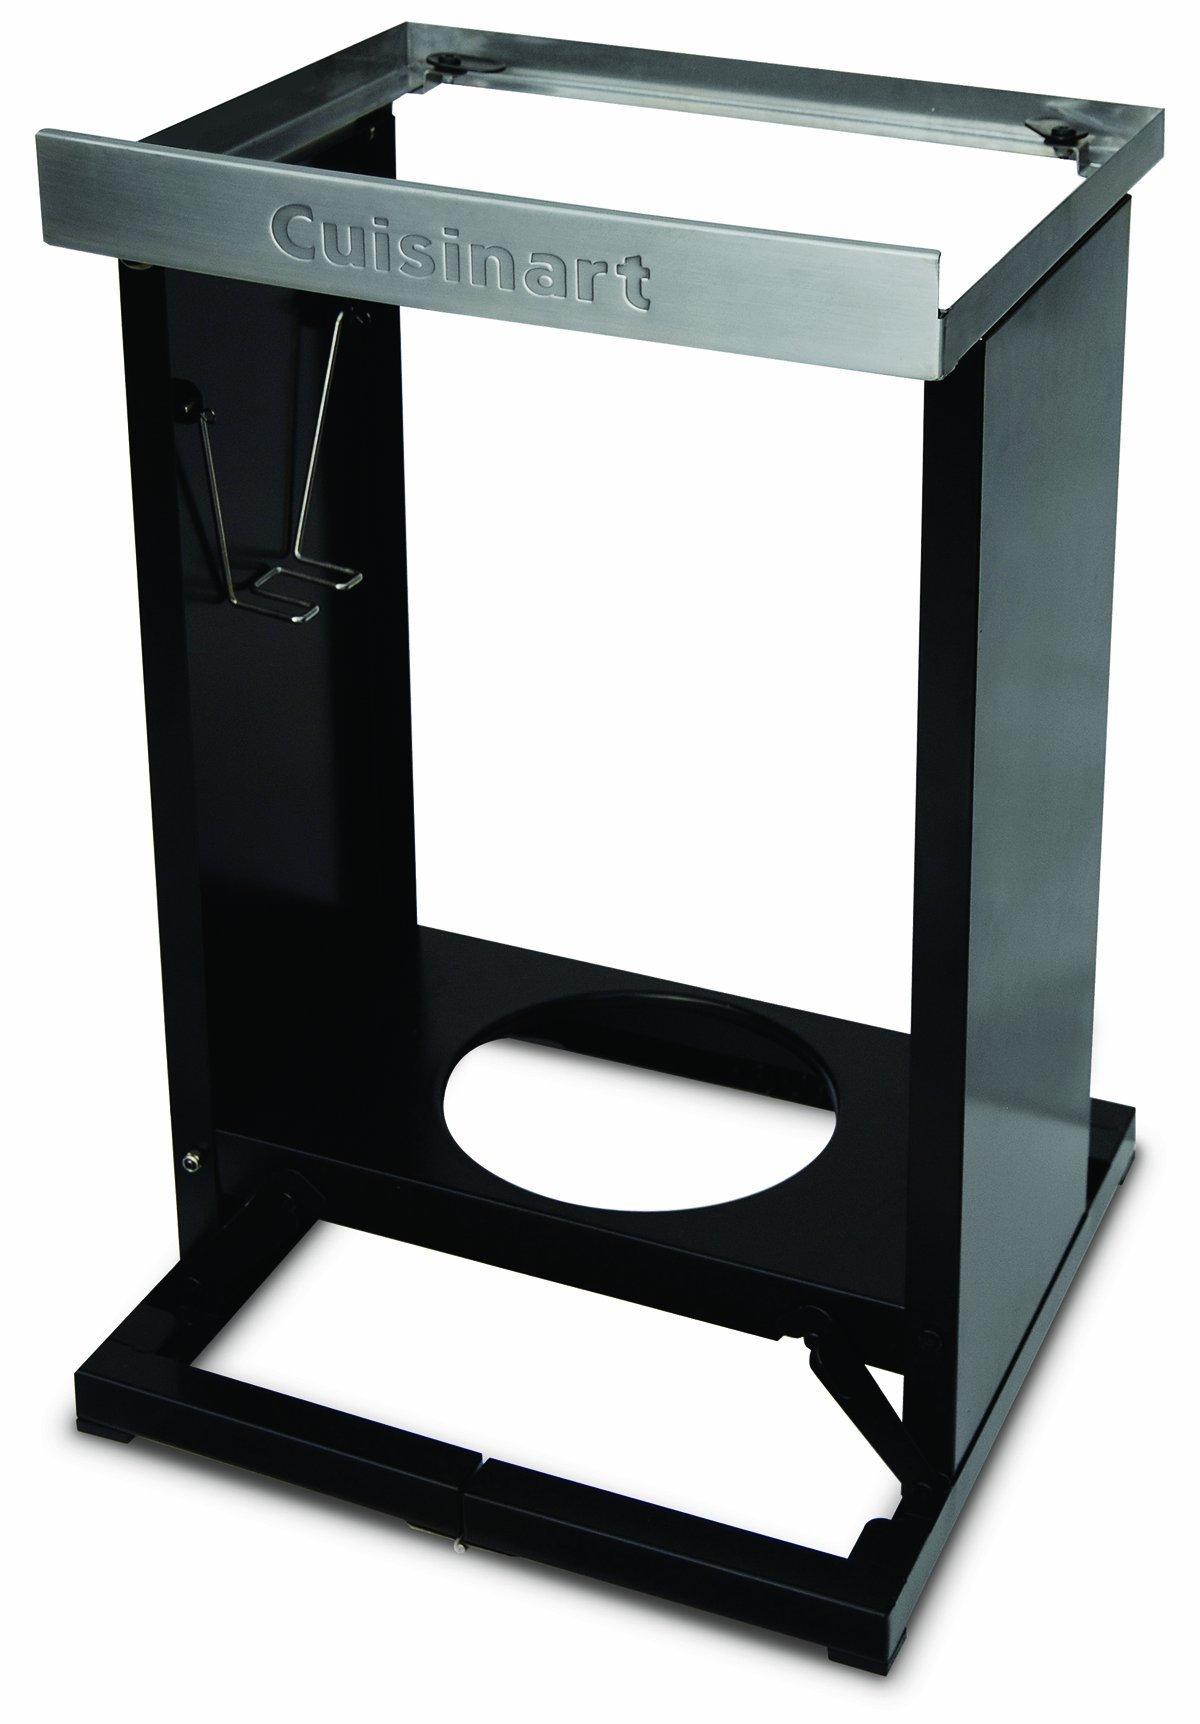 Cuisinart CFGS-150  Folding Grill Stand (Renewed)